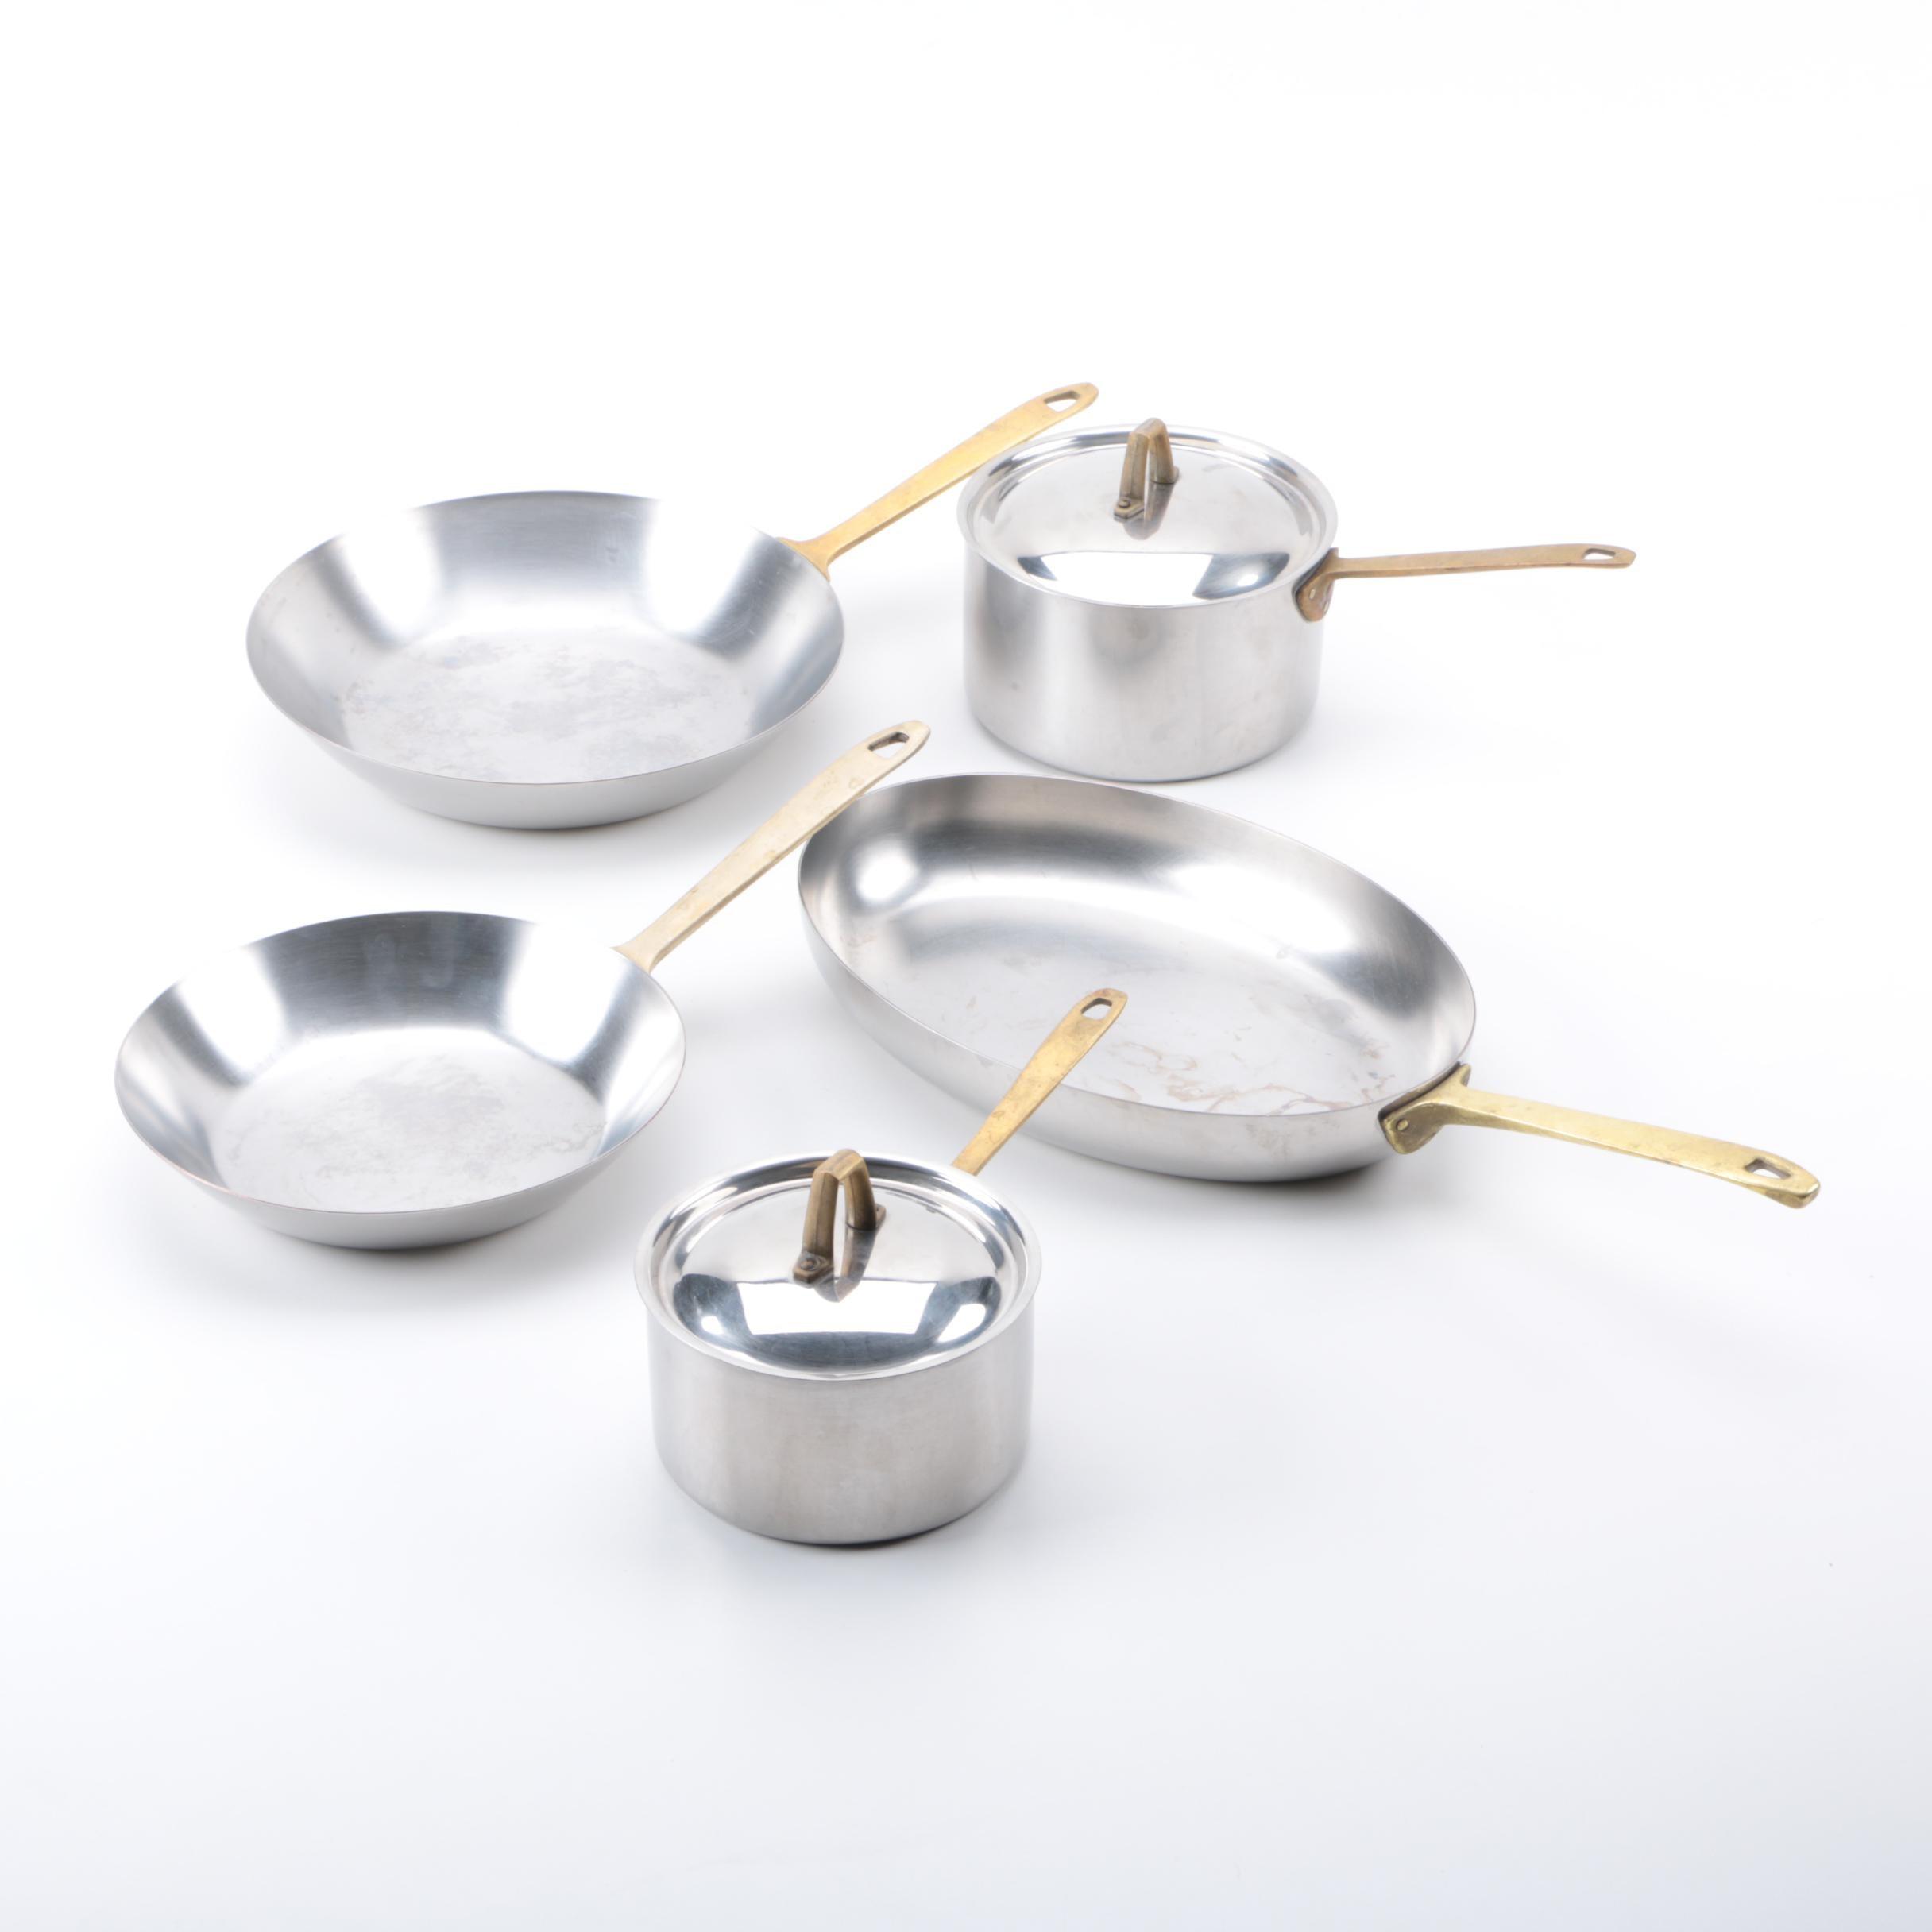 Paul Revere Cookware